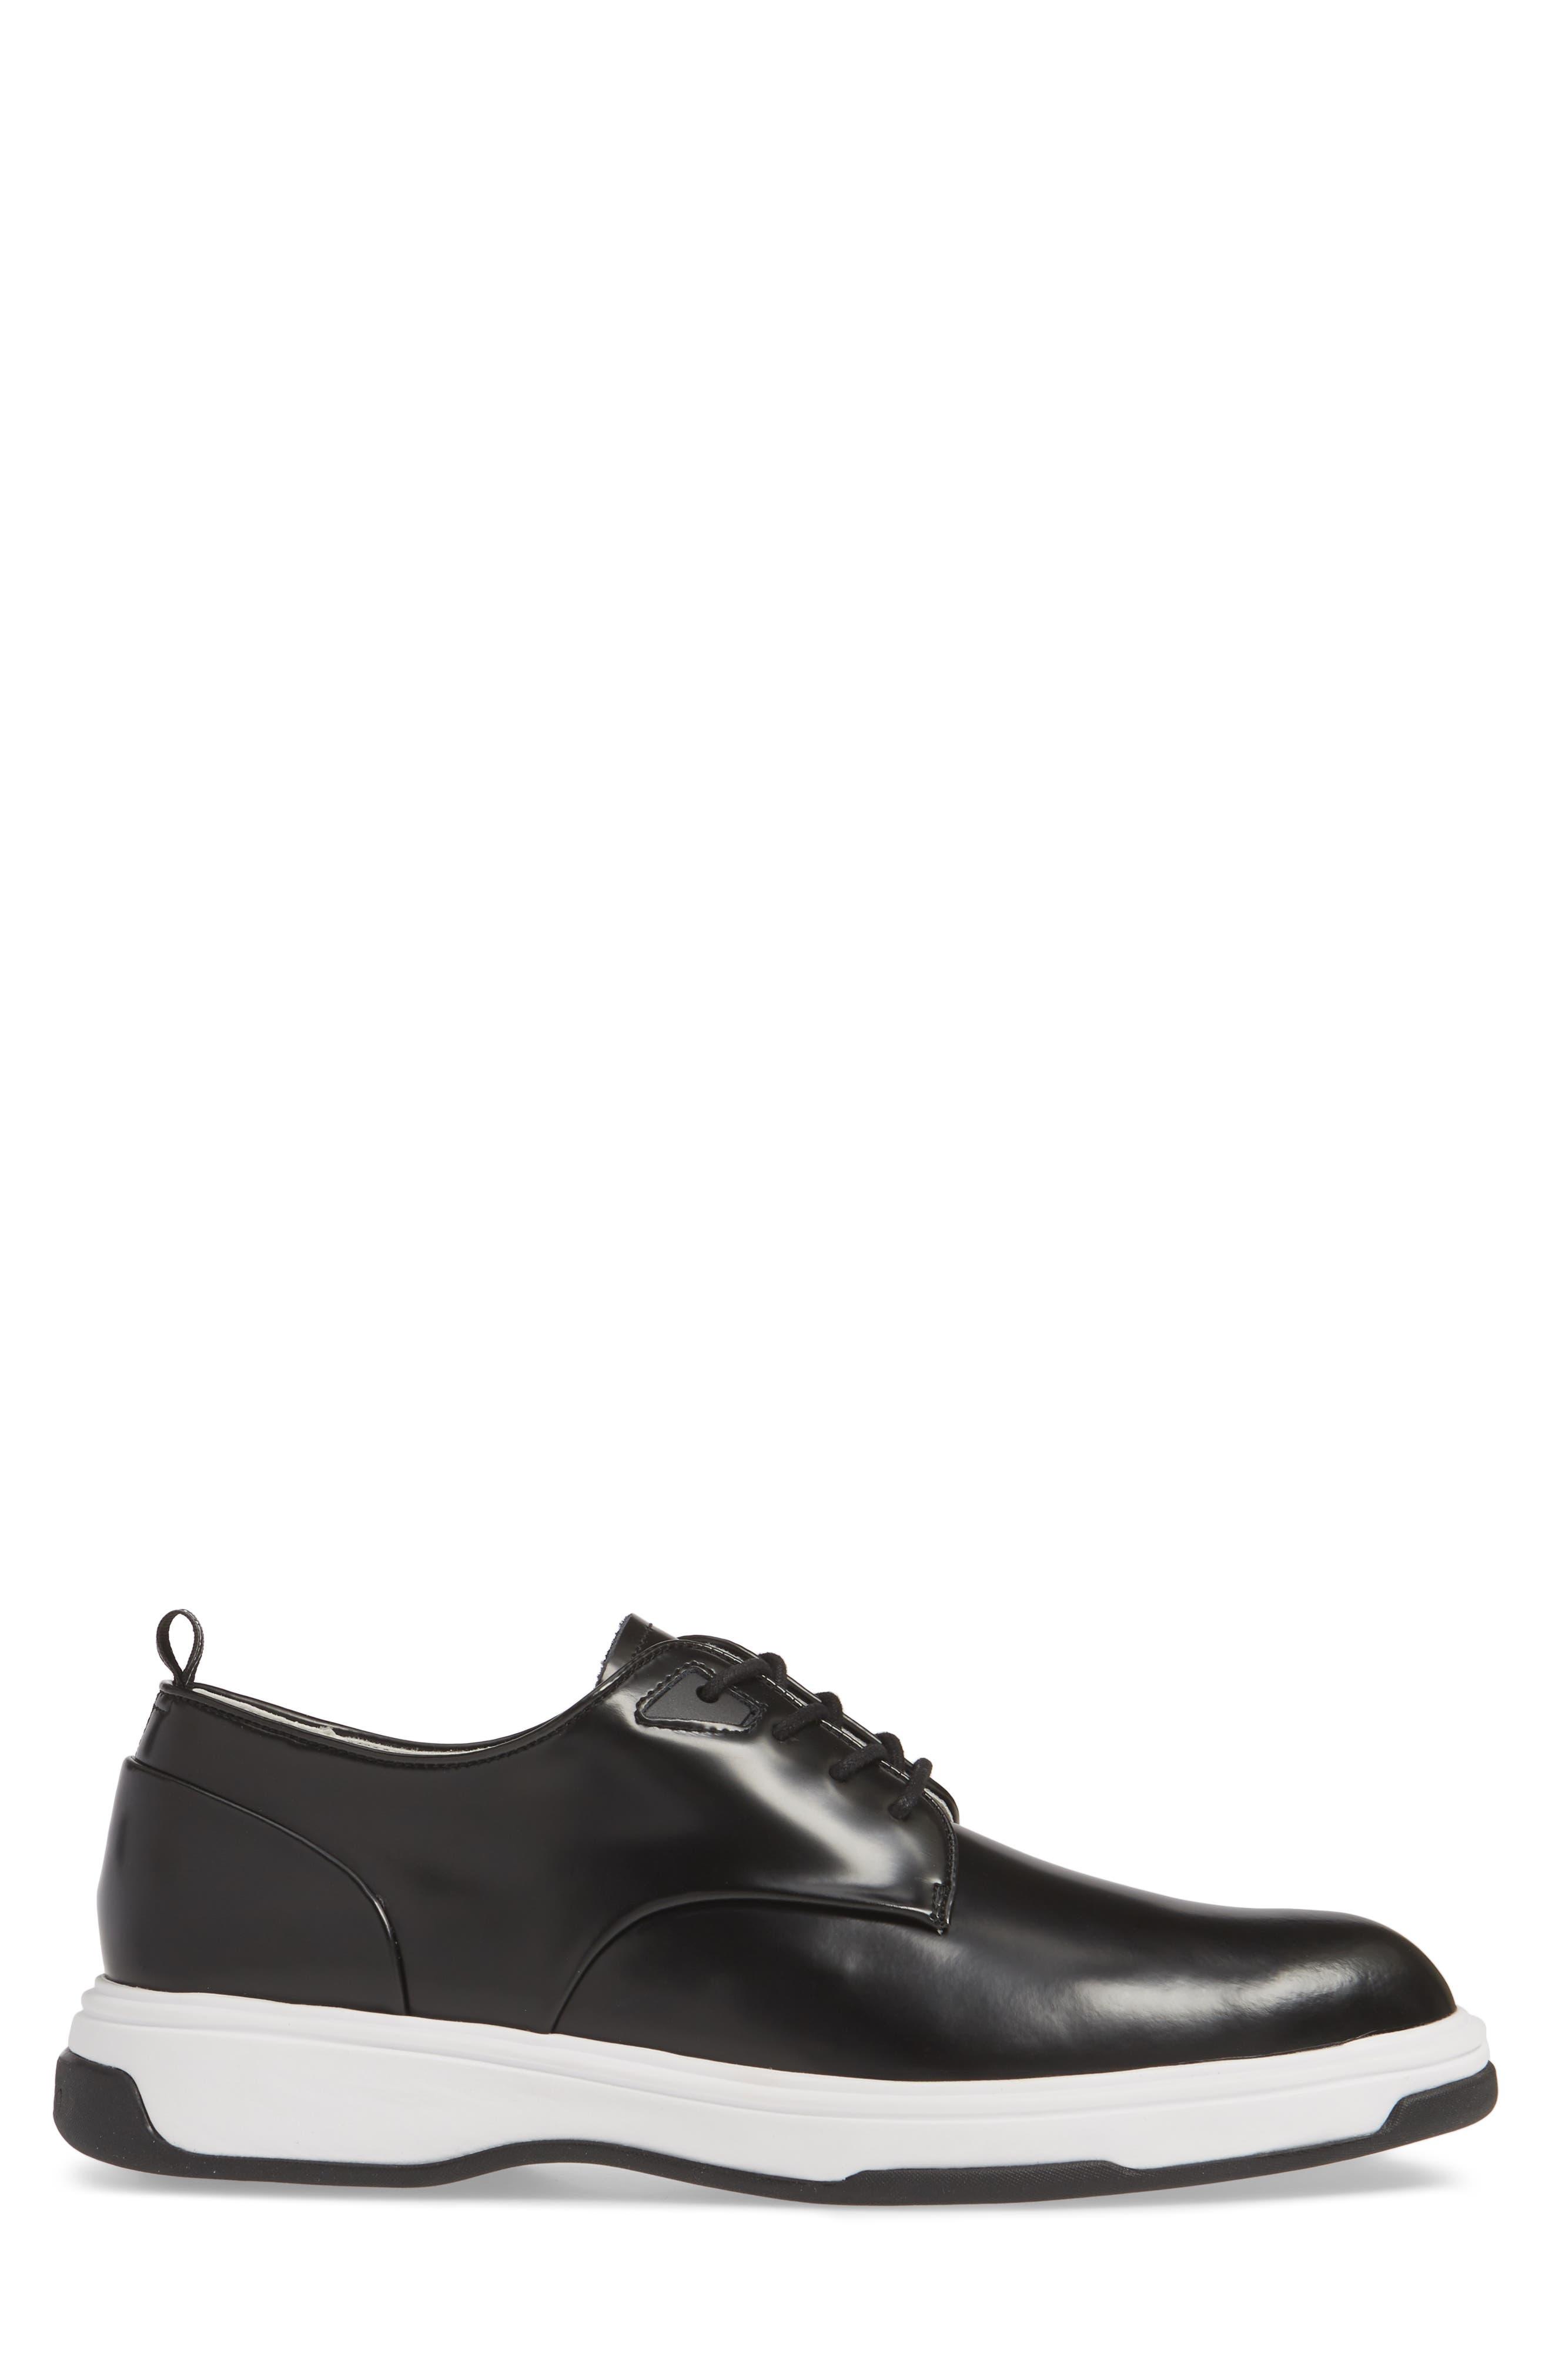 CALVIN KLEIN, Patsy Sneaker, Alternate thumbnail 3, color, BLACK